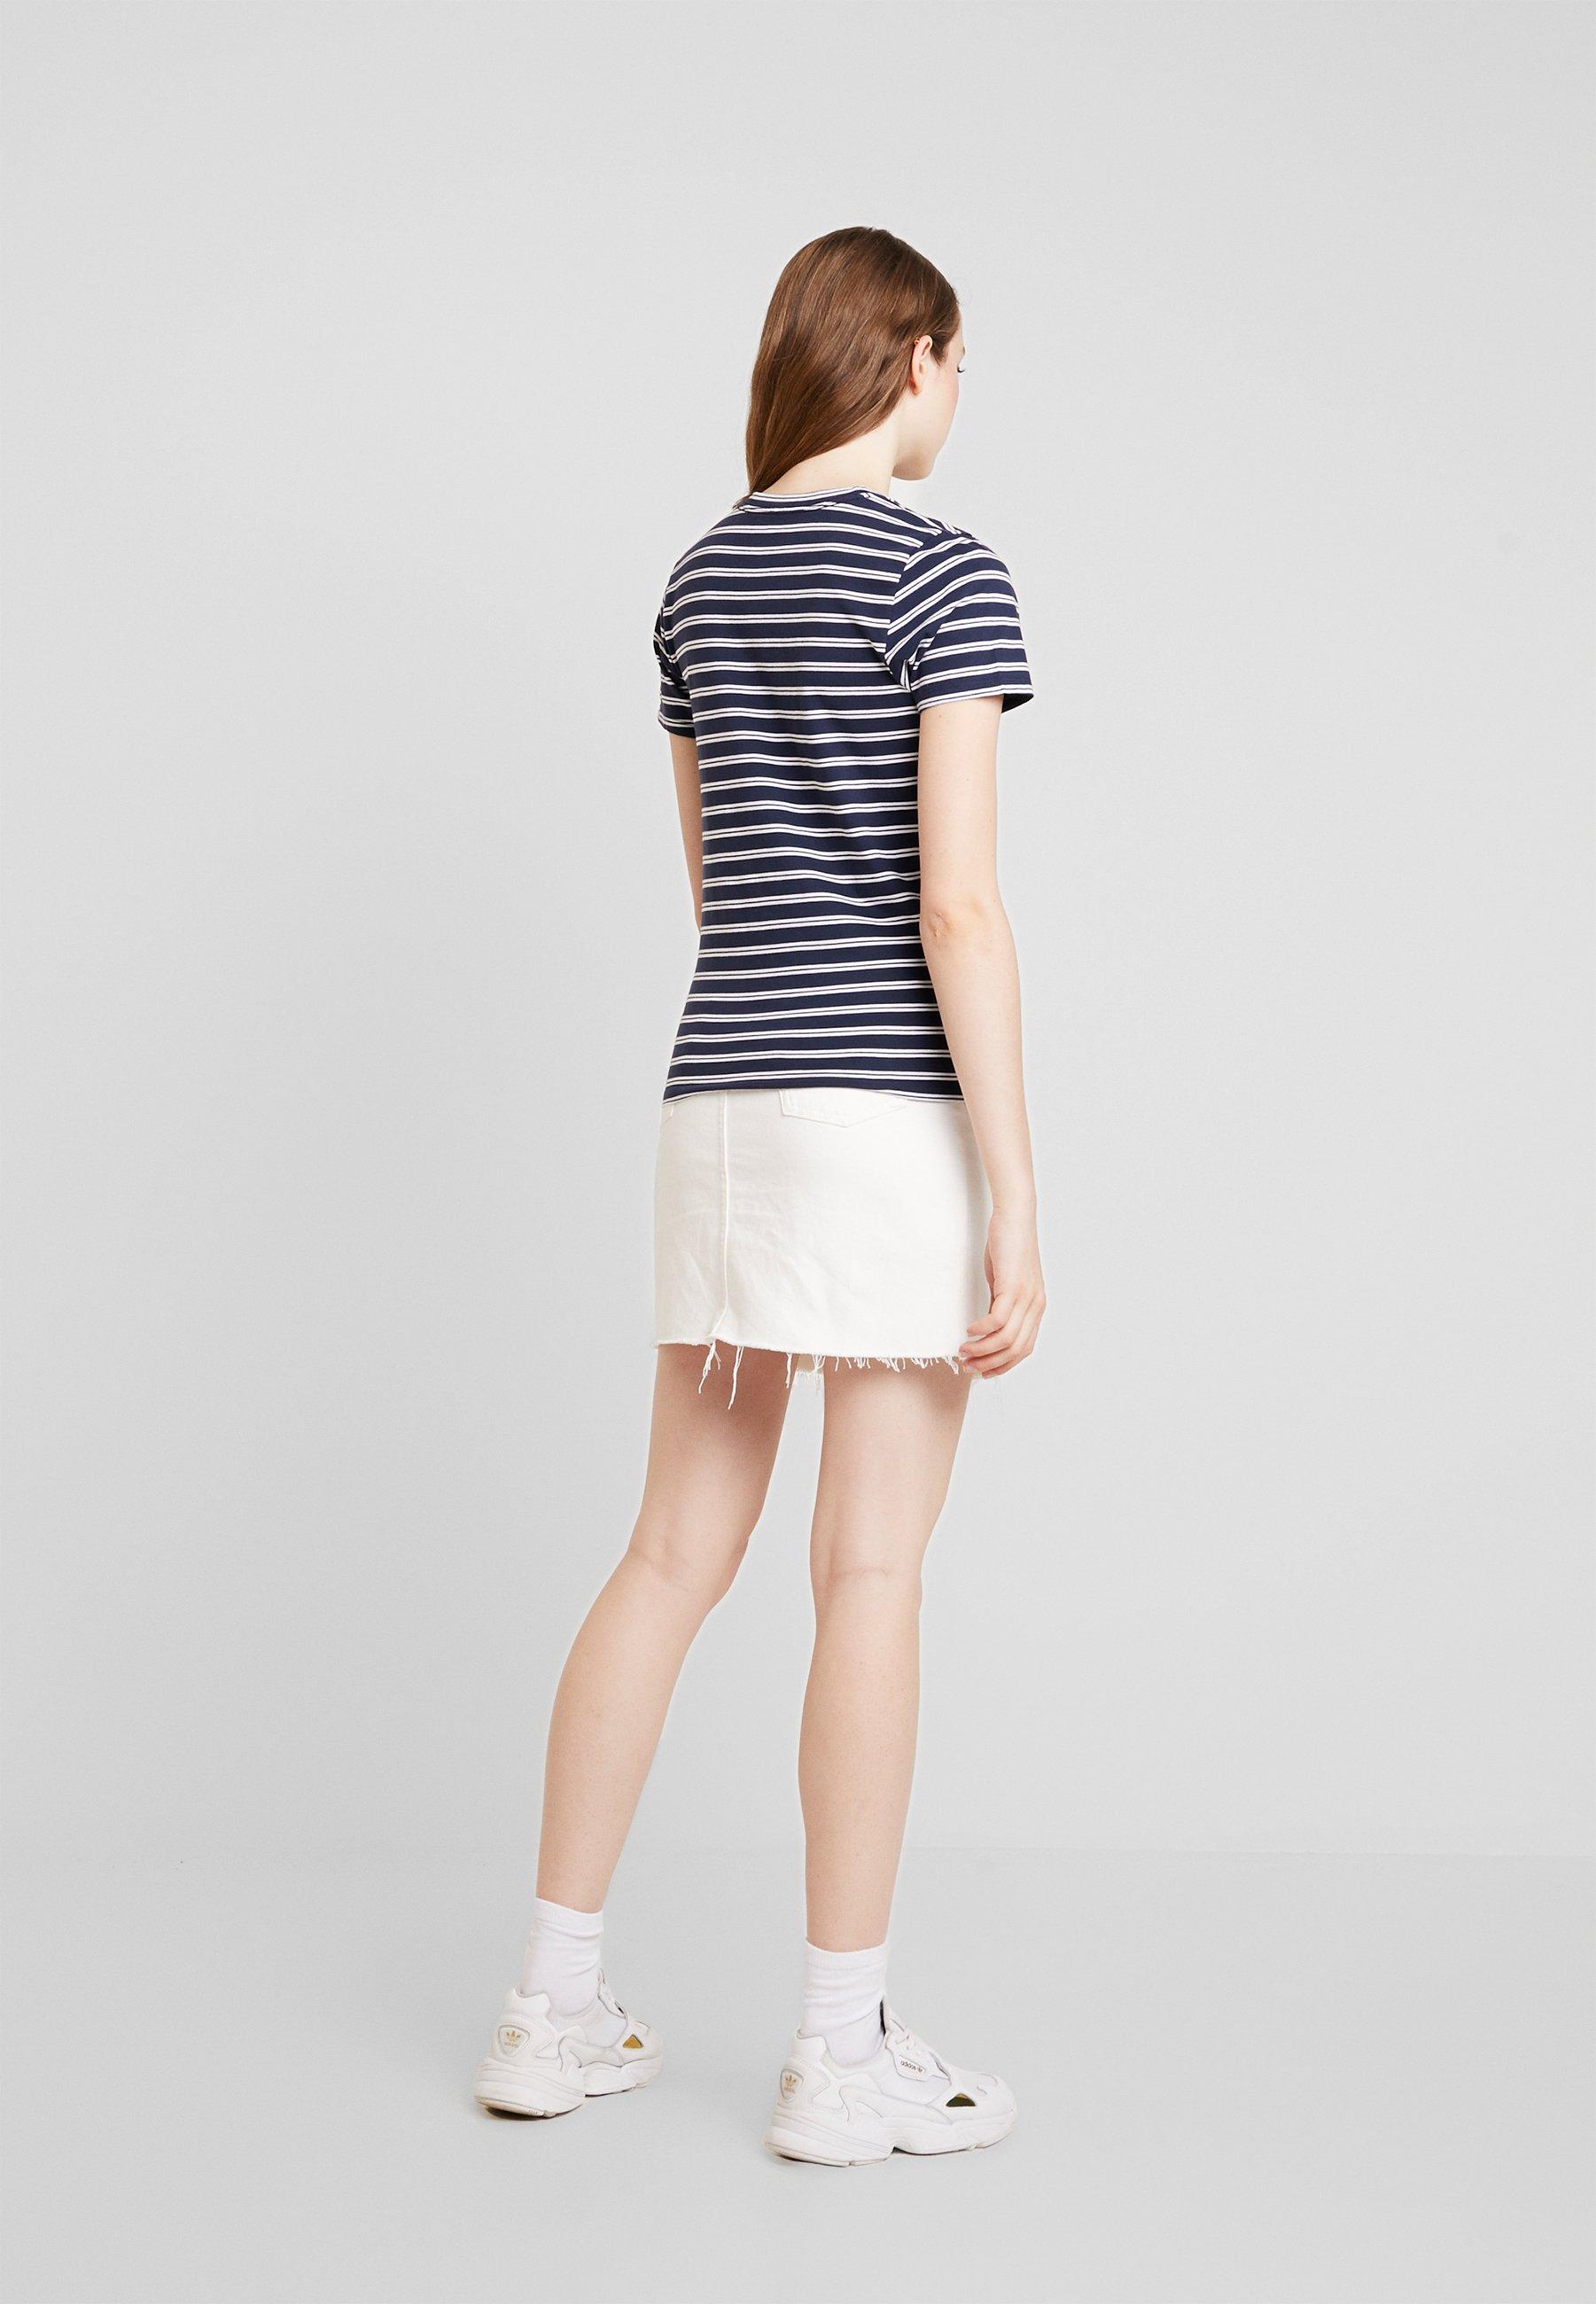 Stampa Stripe Hollister Logo TeeT Navy shirt Con CoMeet Greet BdWrxQCoe